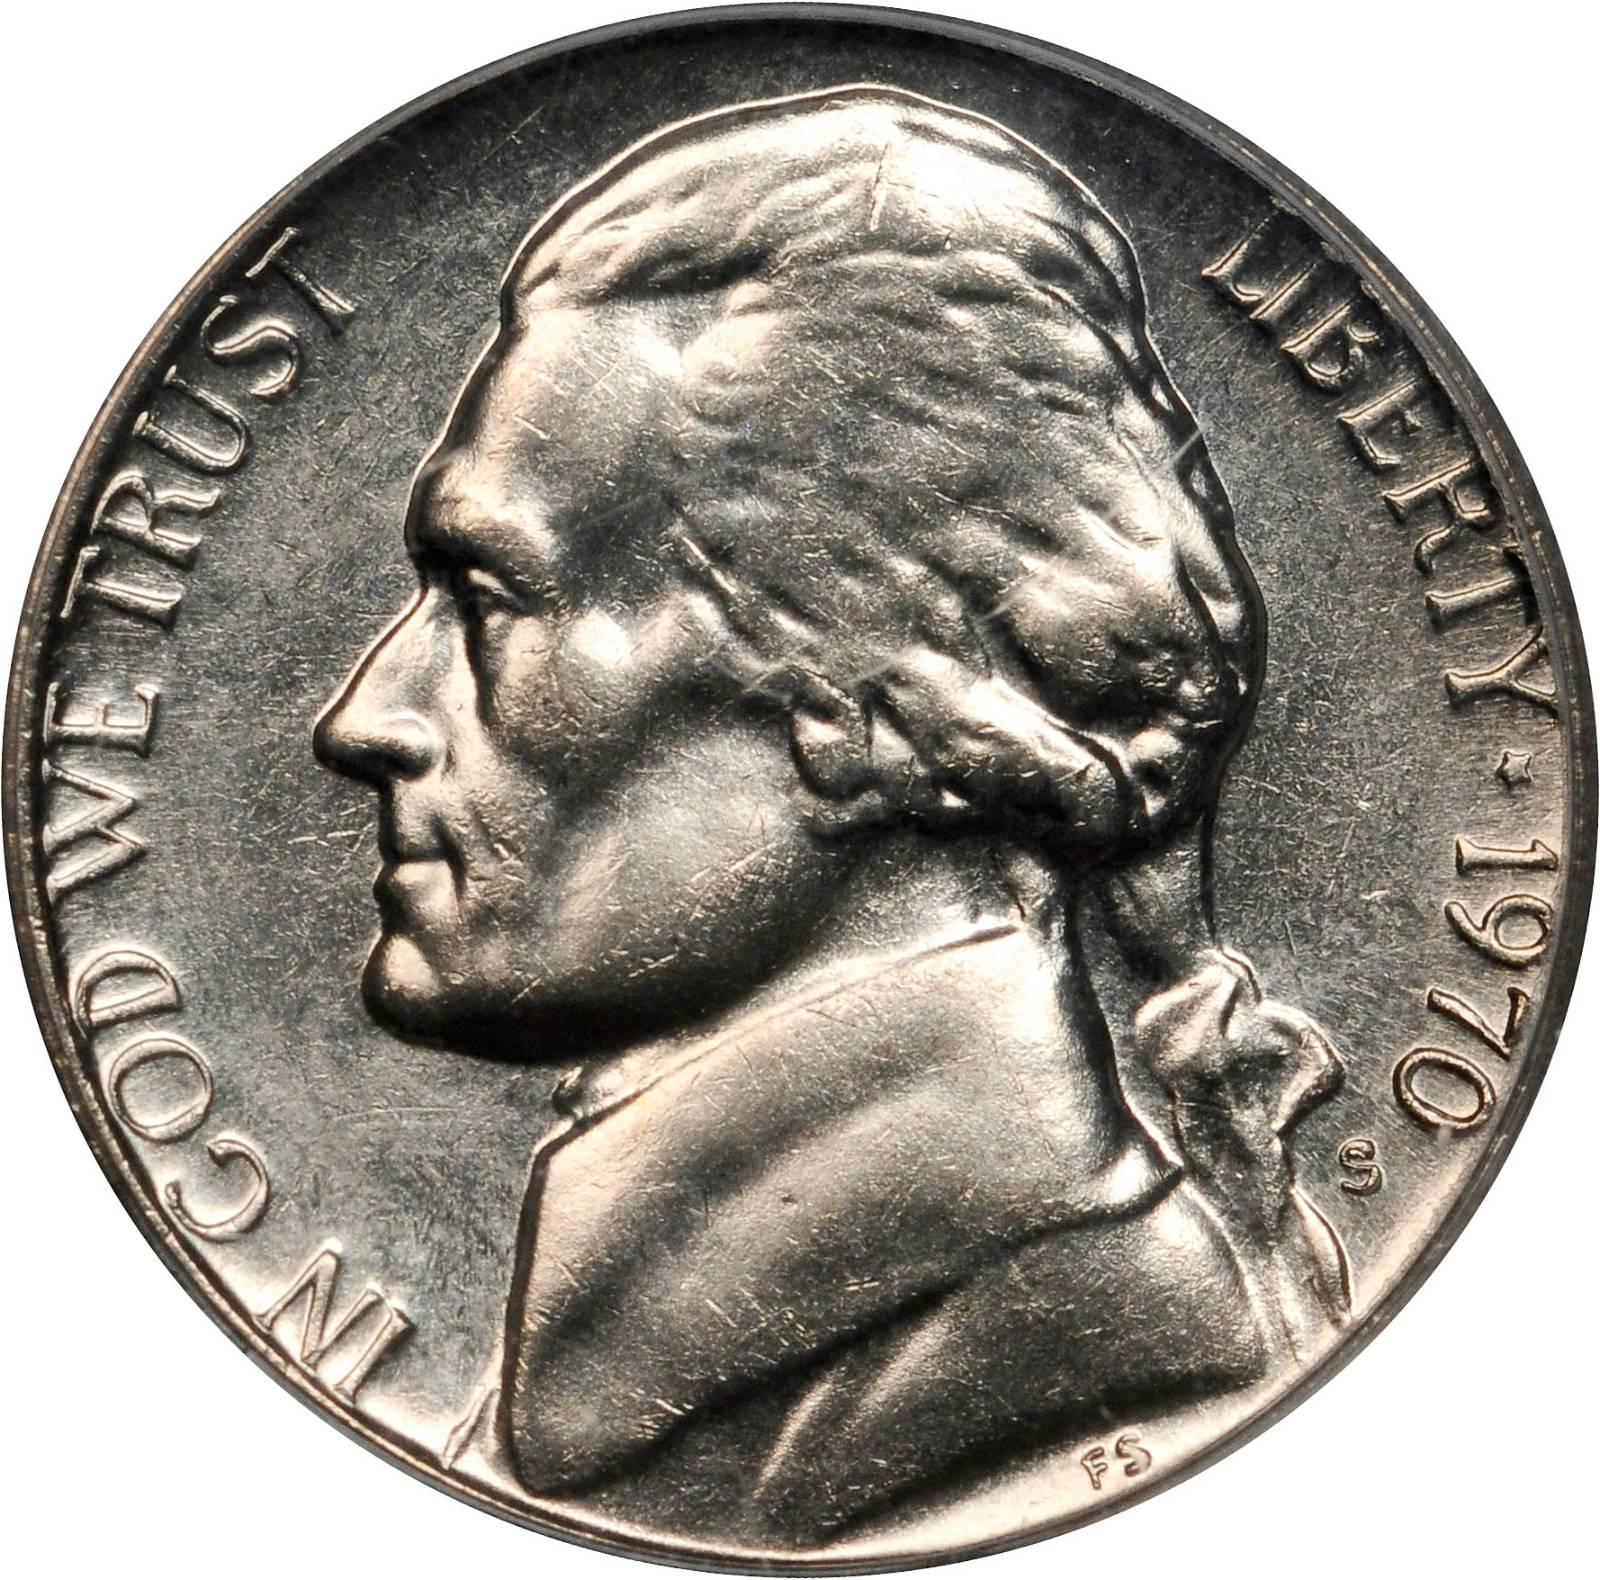 1970-S San Francisco Mint Jefferson 5 Cent Piece BU